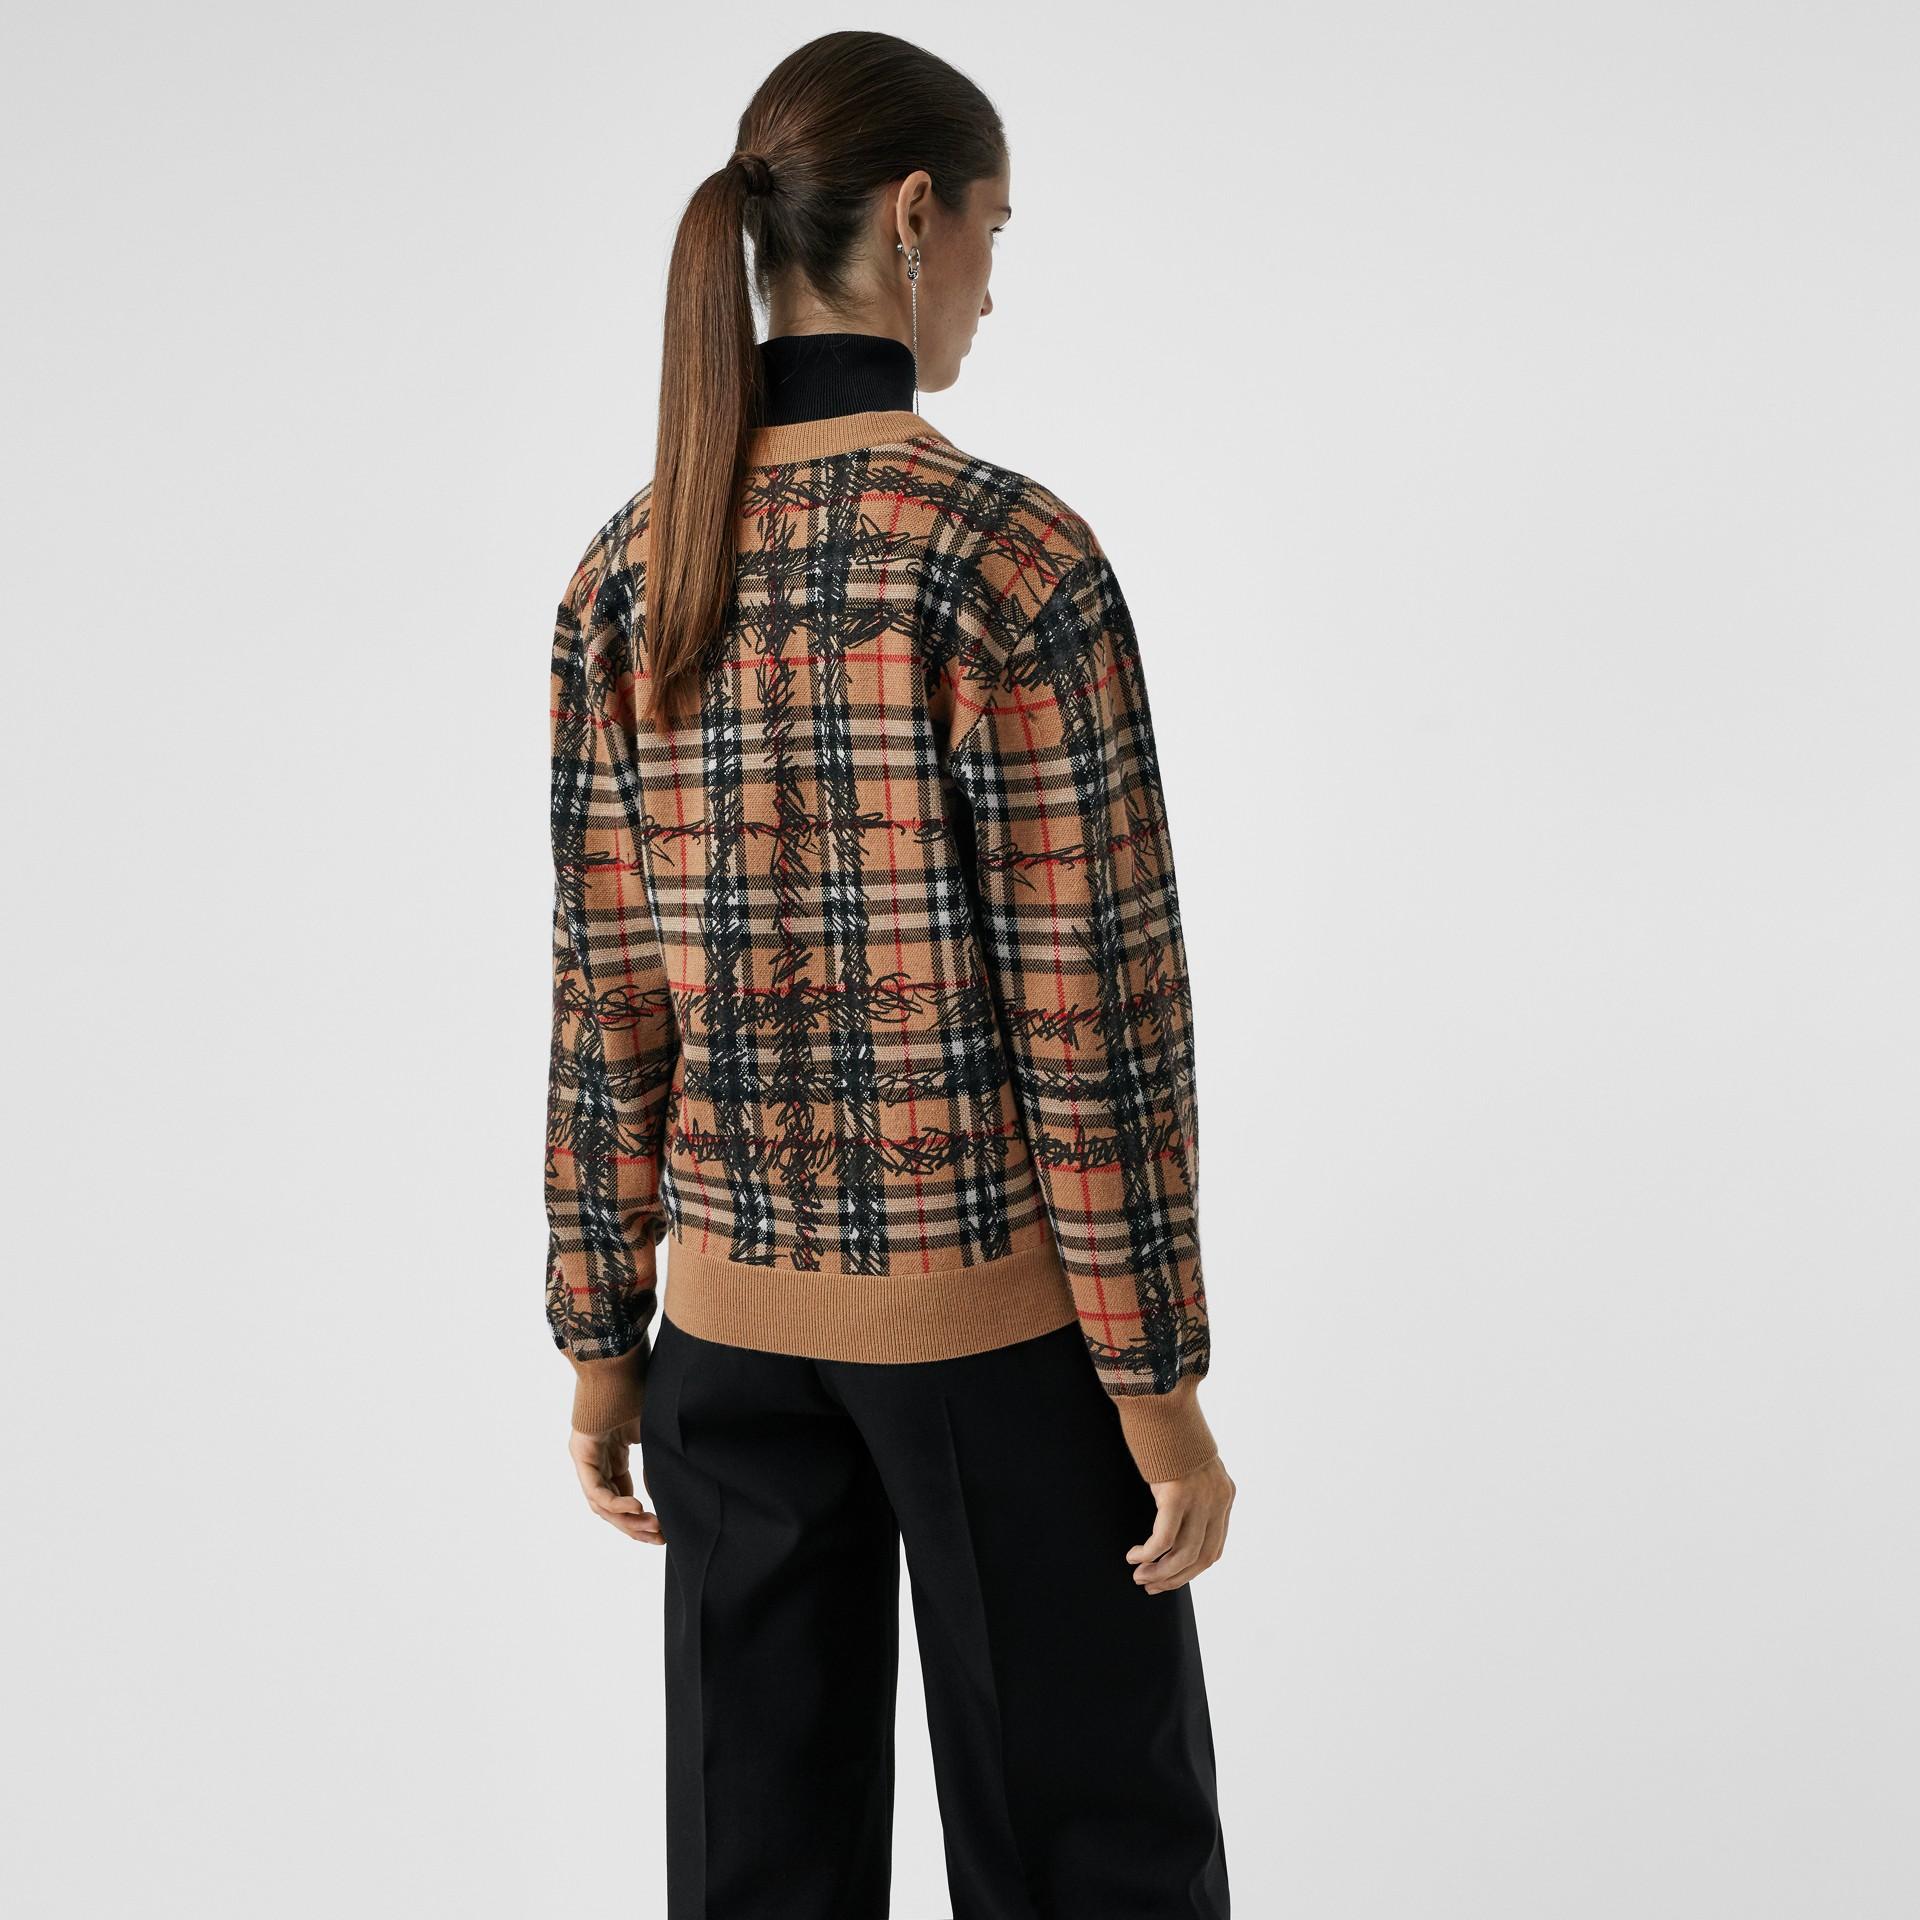 Scribble Check Merino Wool Sweater in Camel/black - Women | Burberry - gallery image 2